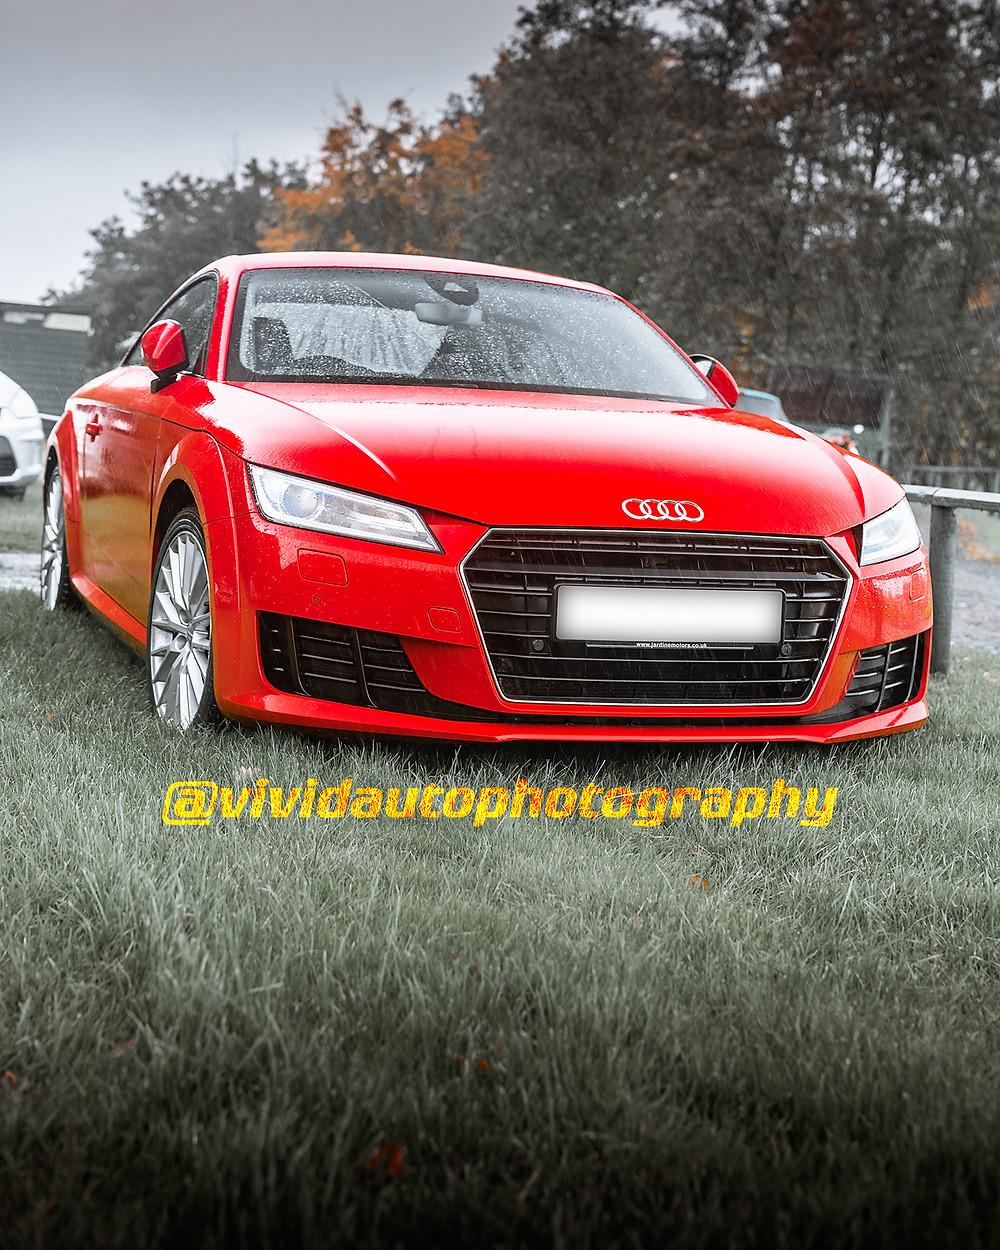 Audi TT | Red | Front three quarters poster